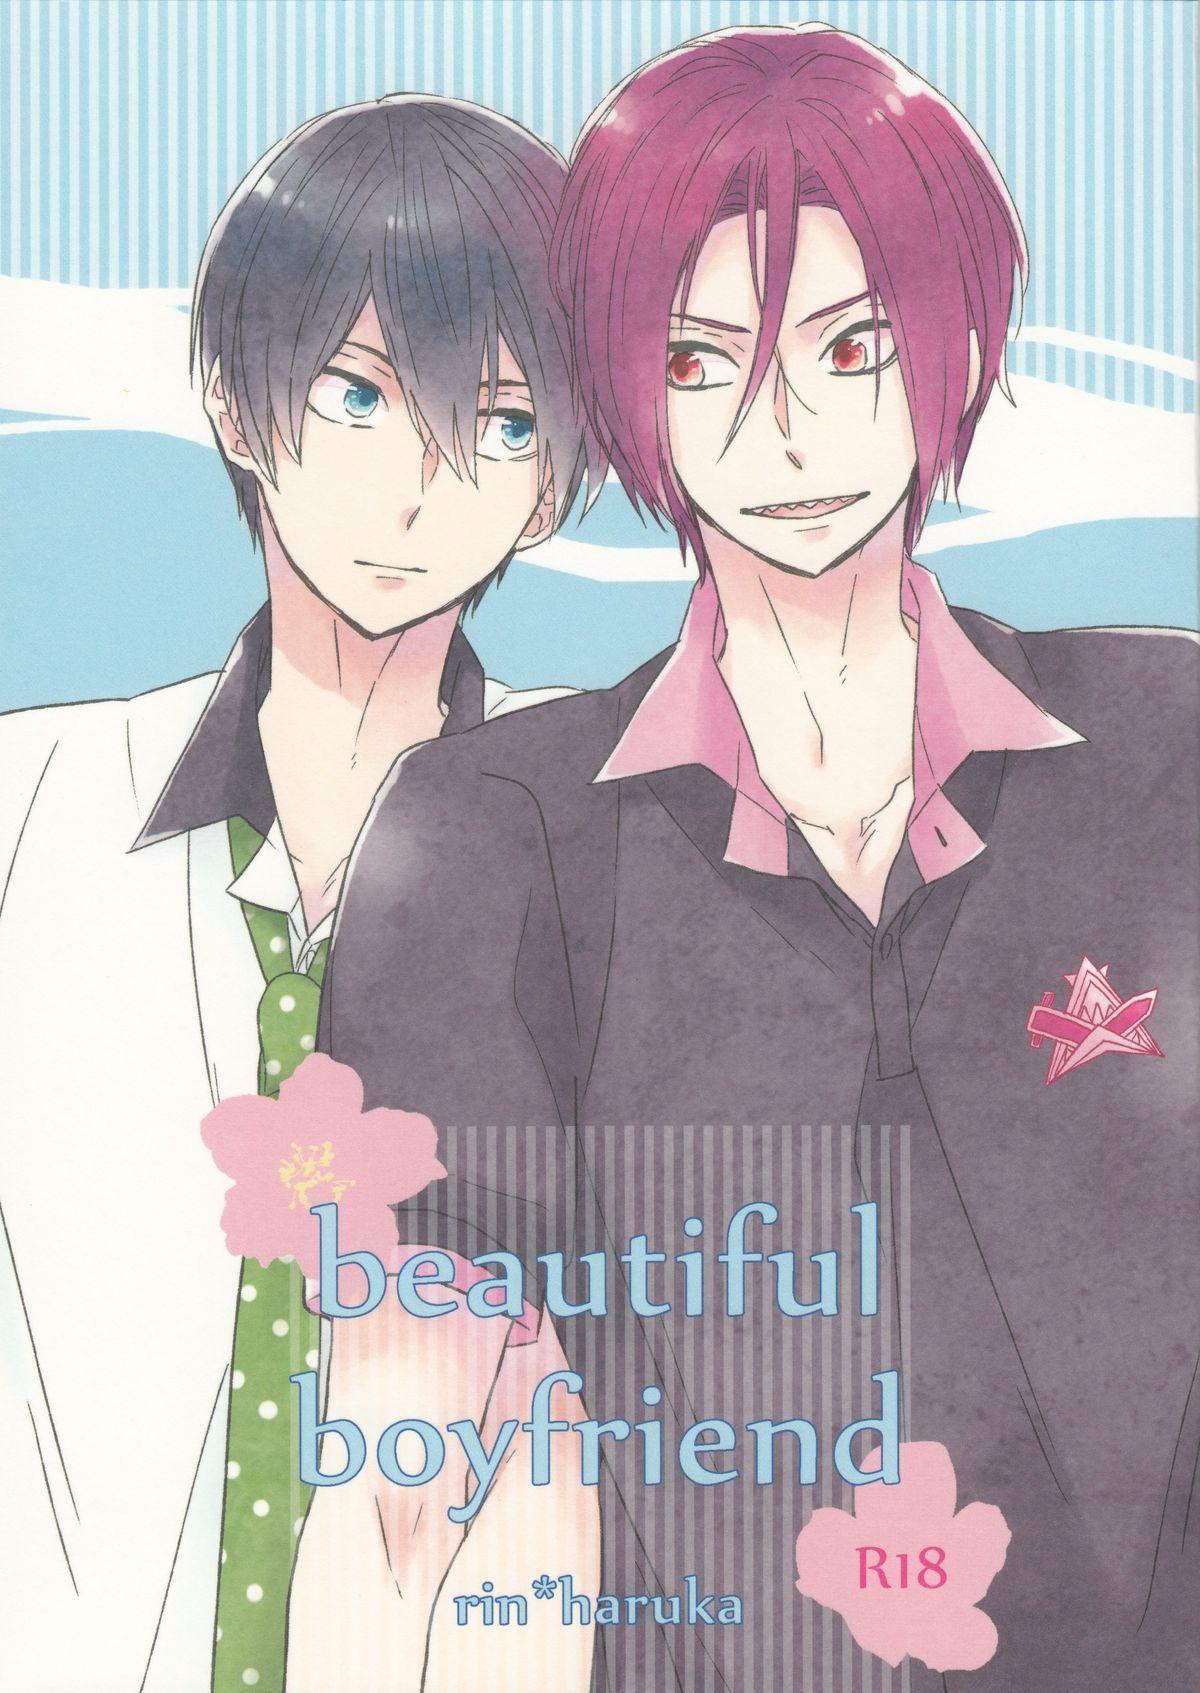 【Free!ボーイズラブ漫画】凛×遙「beautiful boyfriend」※18禁【BLエロ同人誌】